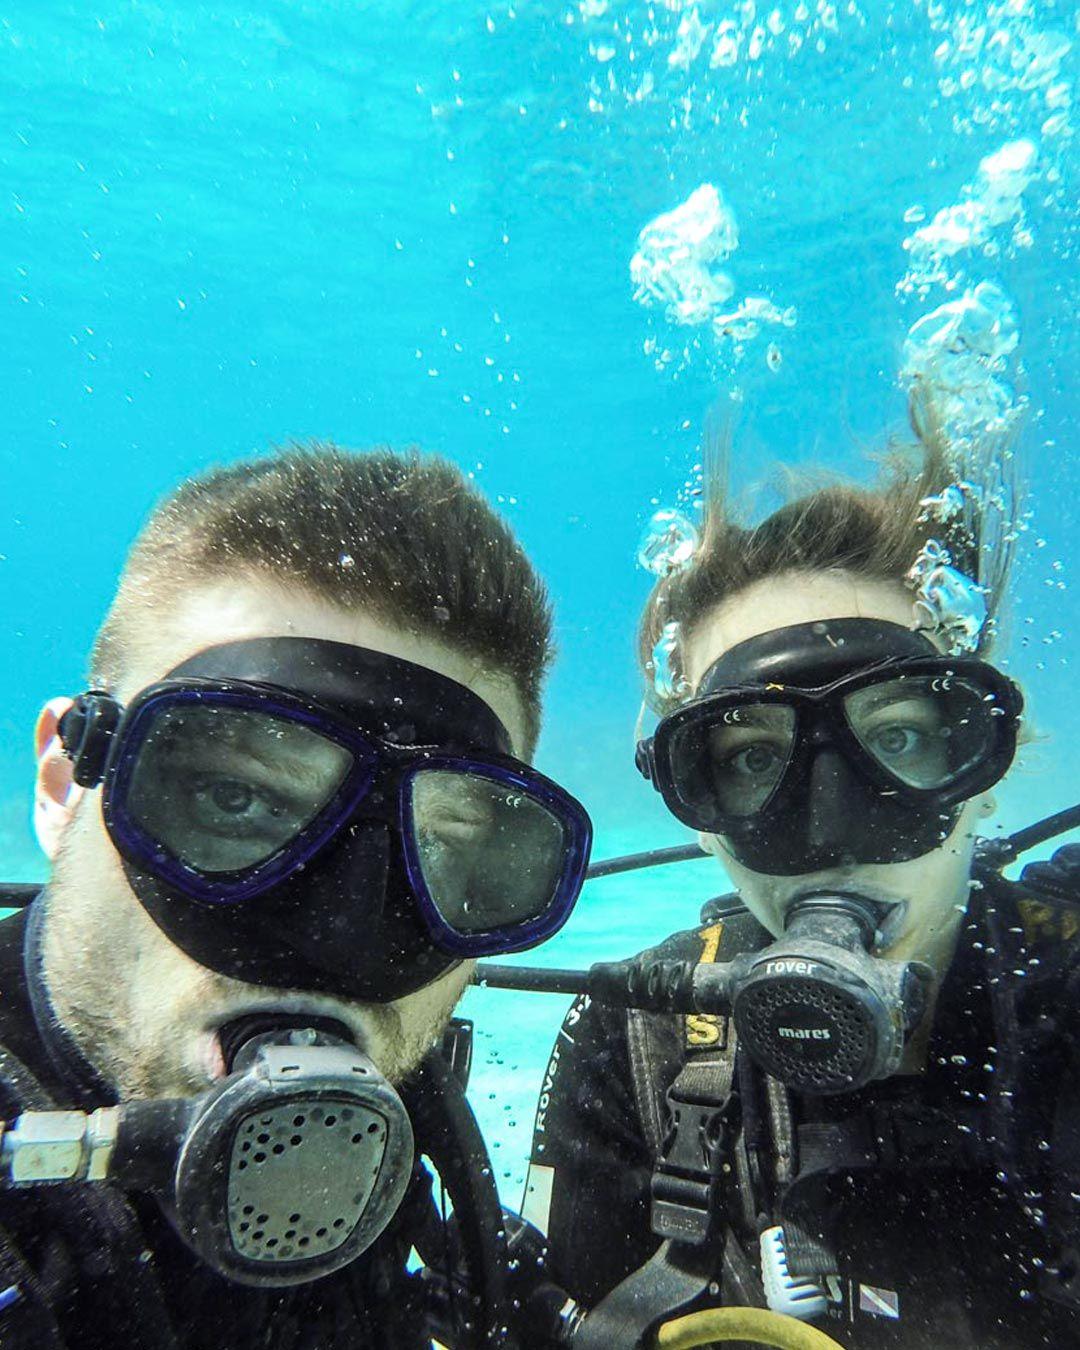 Kuba Tauchen Tauchgang Ausflug Karibik Meer Tauchen Ausflug